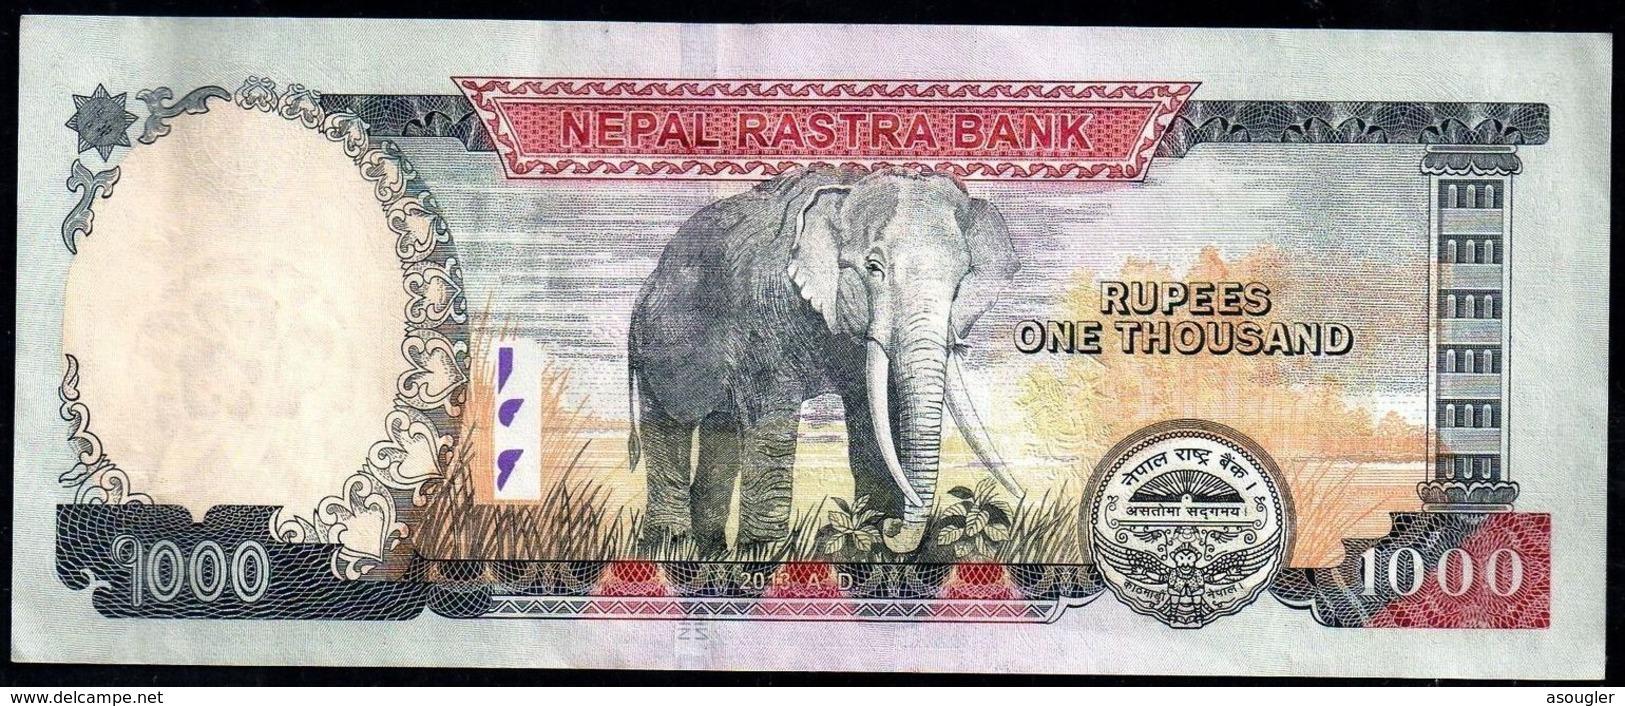 NEPAL 1000 RUPEES 2013 VF-EXF - Nepal